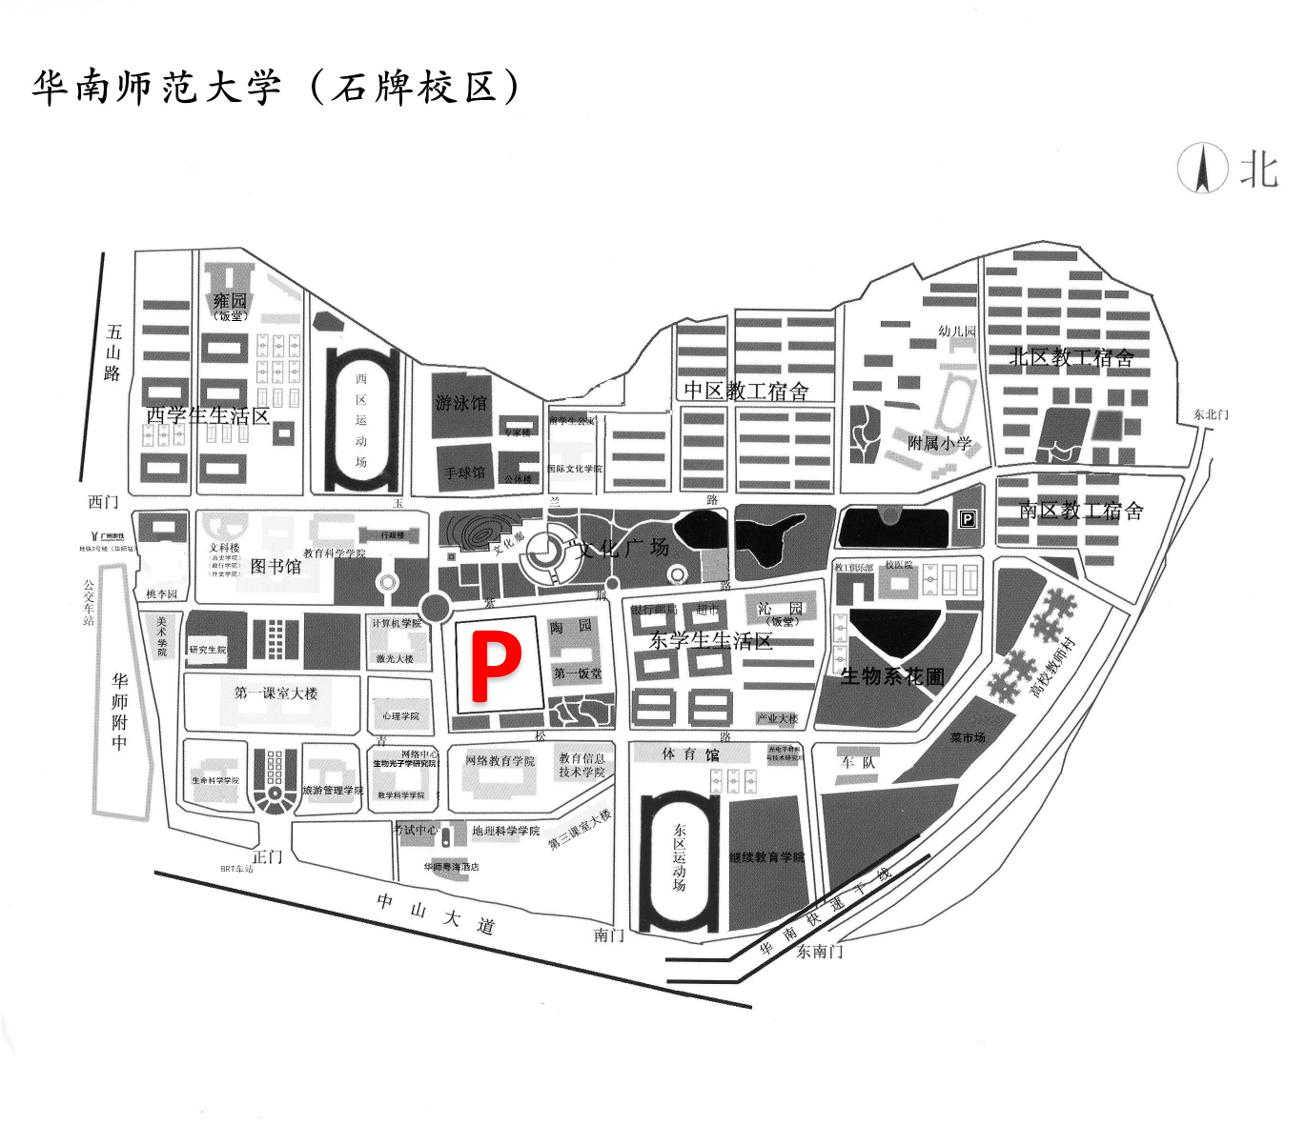 石牌地图.png